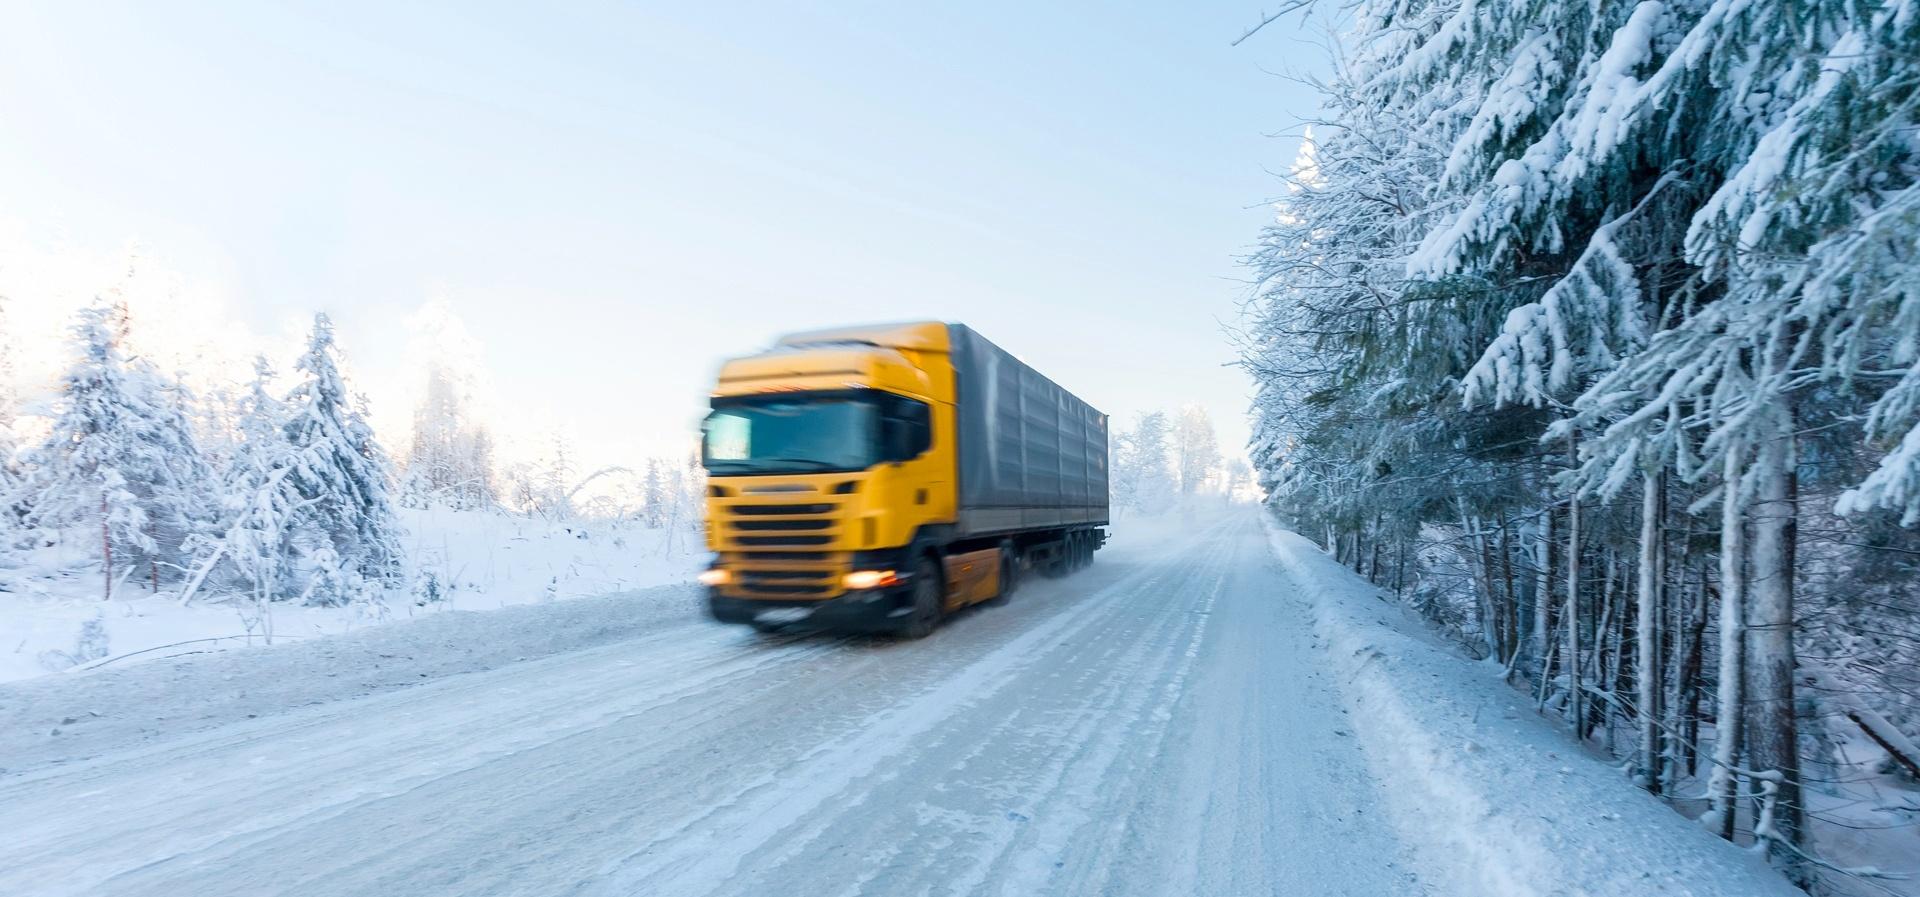 Winter Weather - Truck